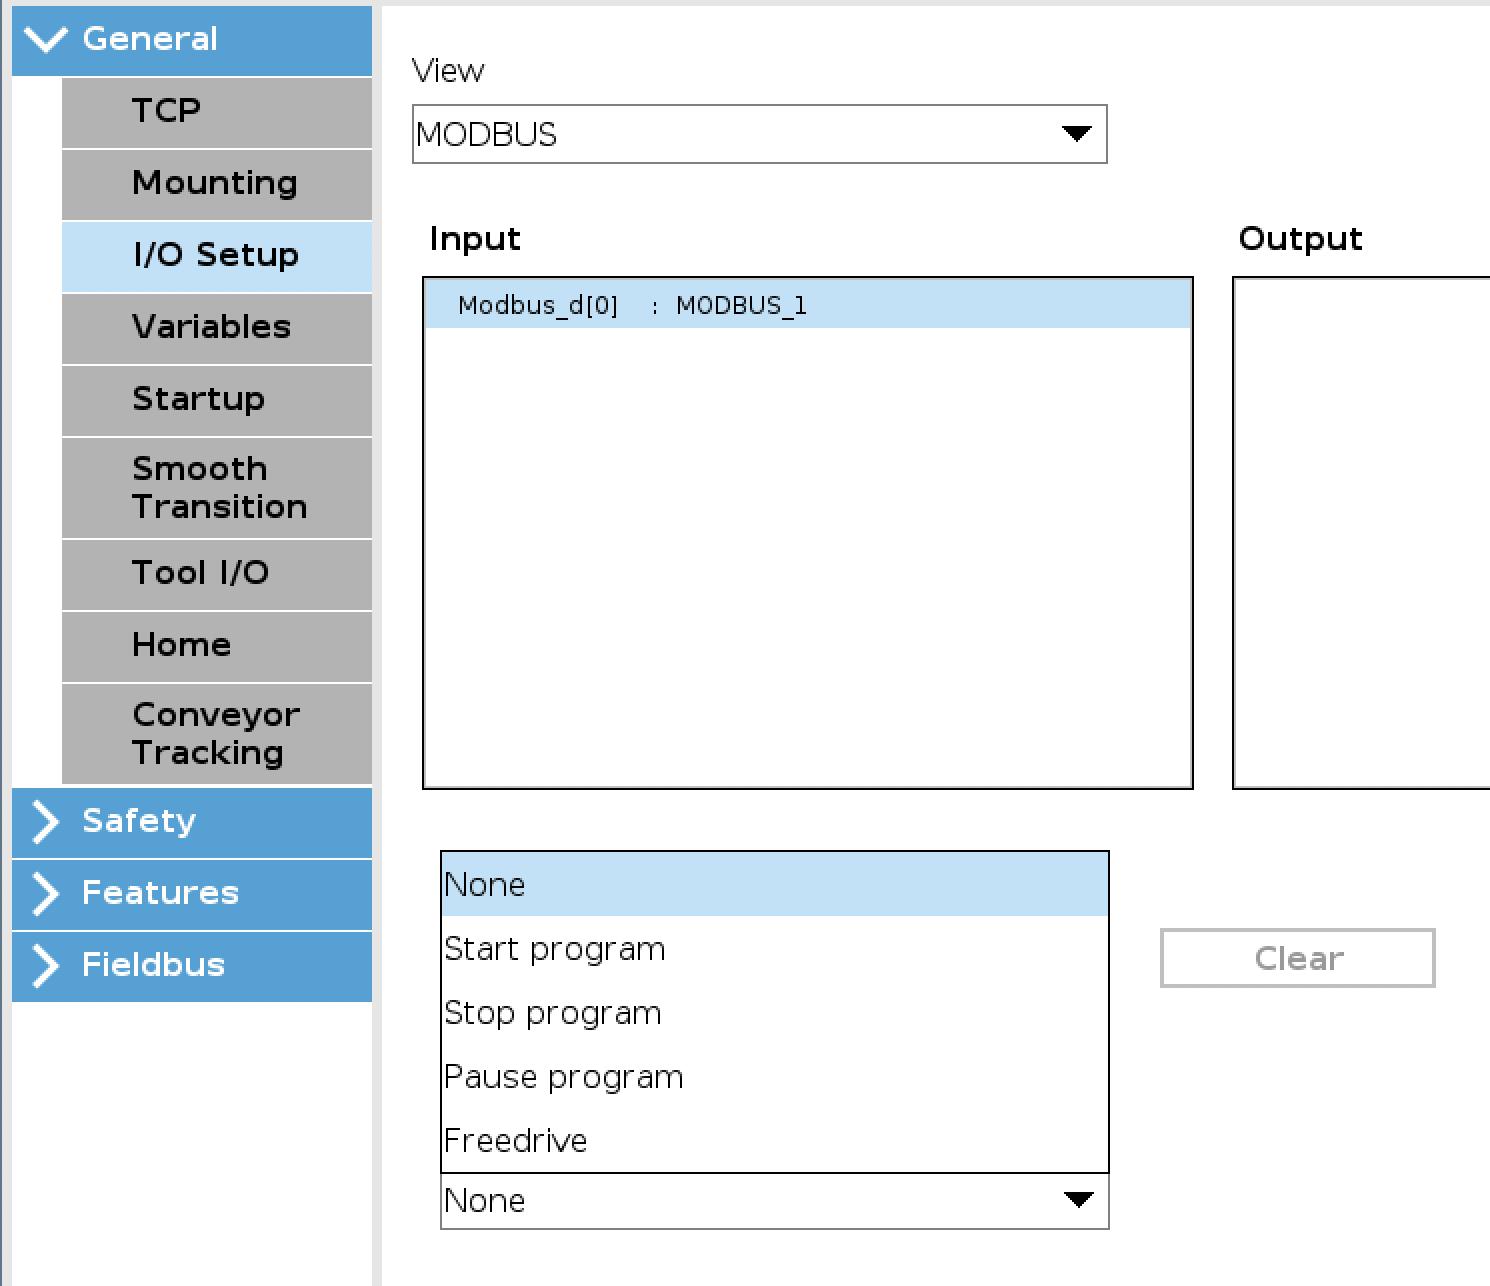 Modbus Commands in UR e series — DoF